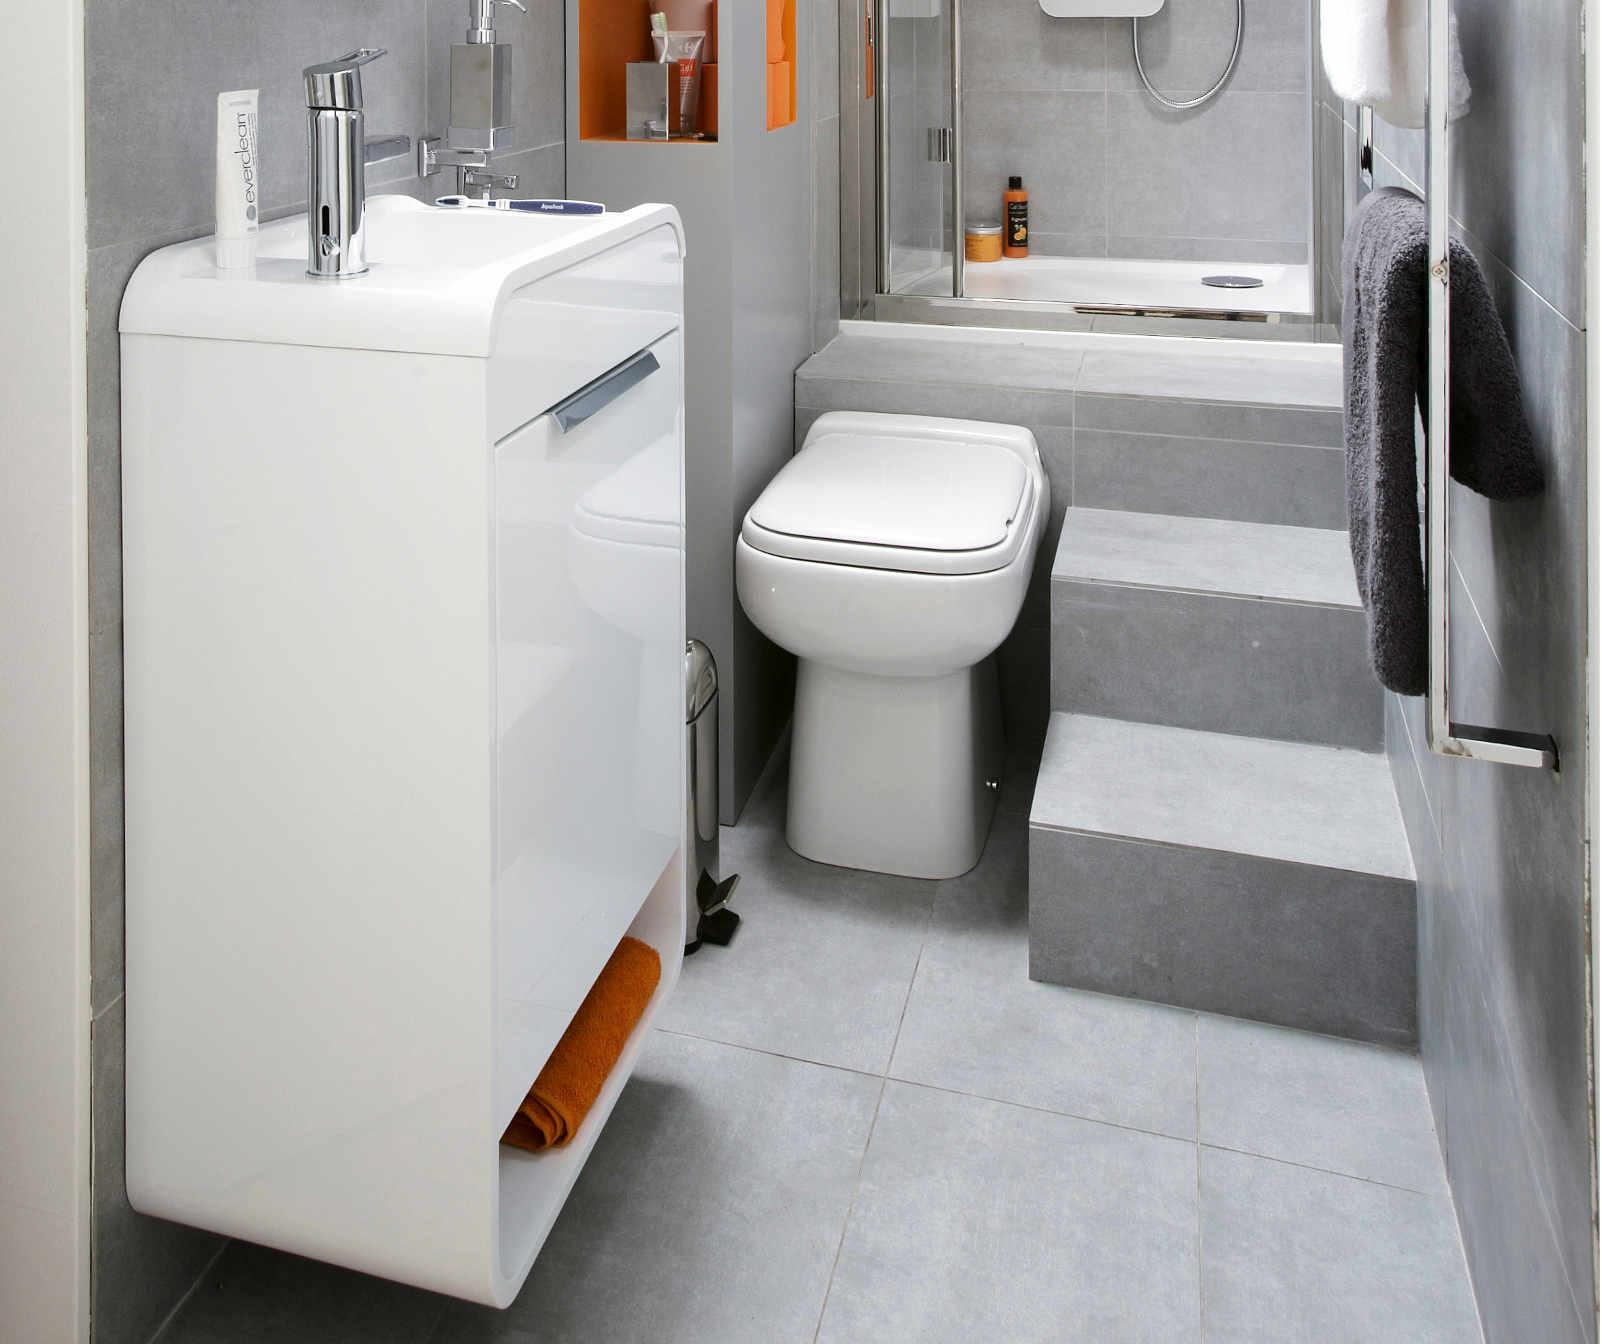 sanibroyeur castorama dco wc deco smiley mulhouse une. Black Bedroom Furniture Sets. Home Design Ideas